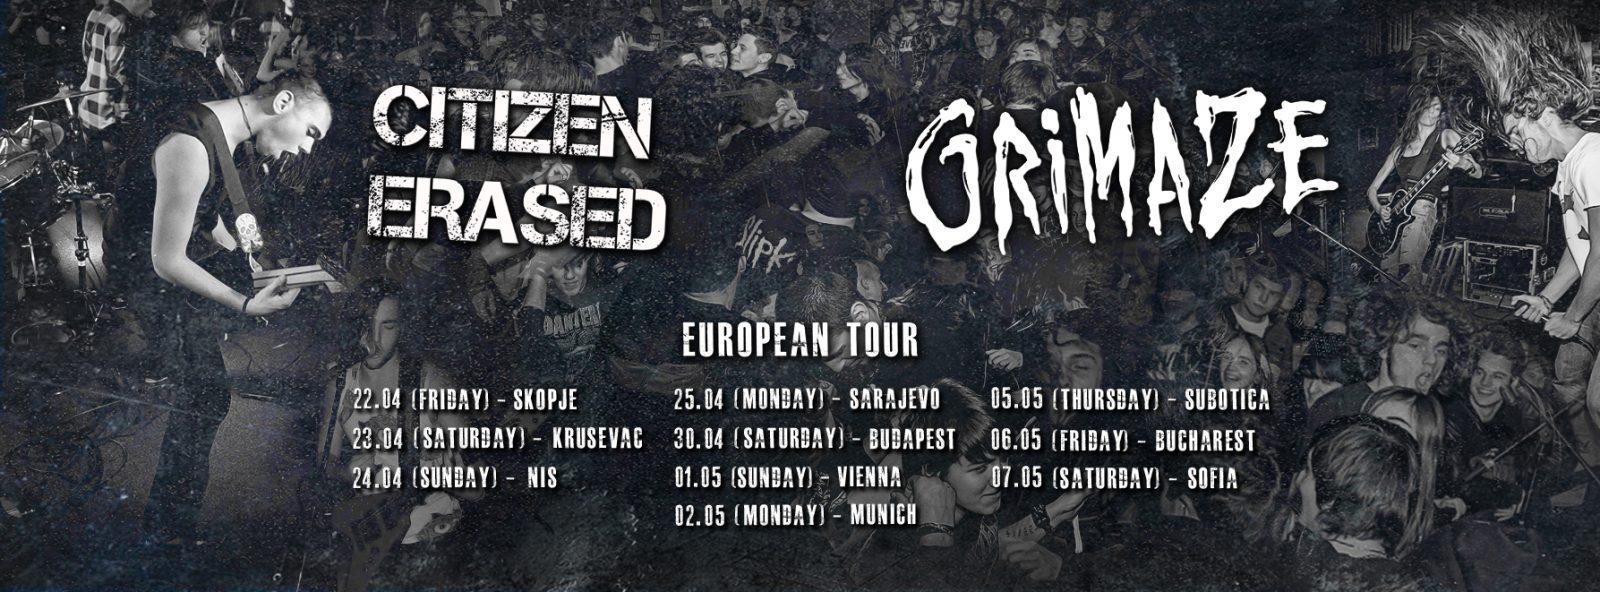 Grimaze & Citizen Erased EU Tour all dates fb fin